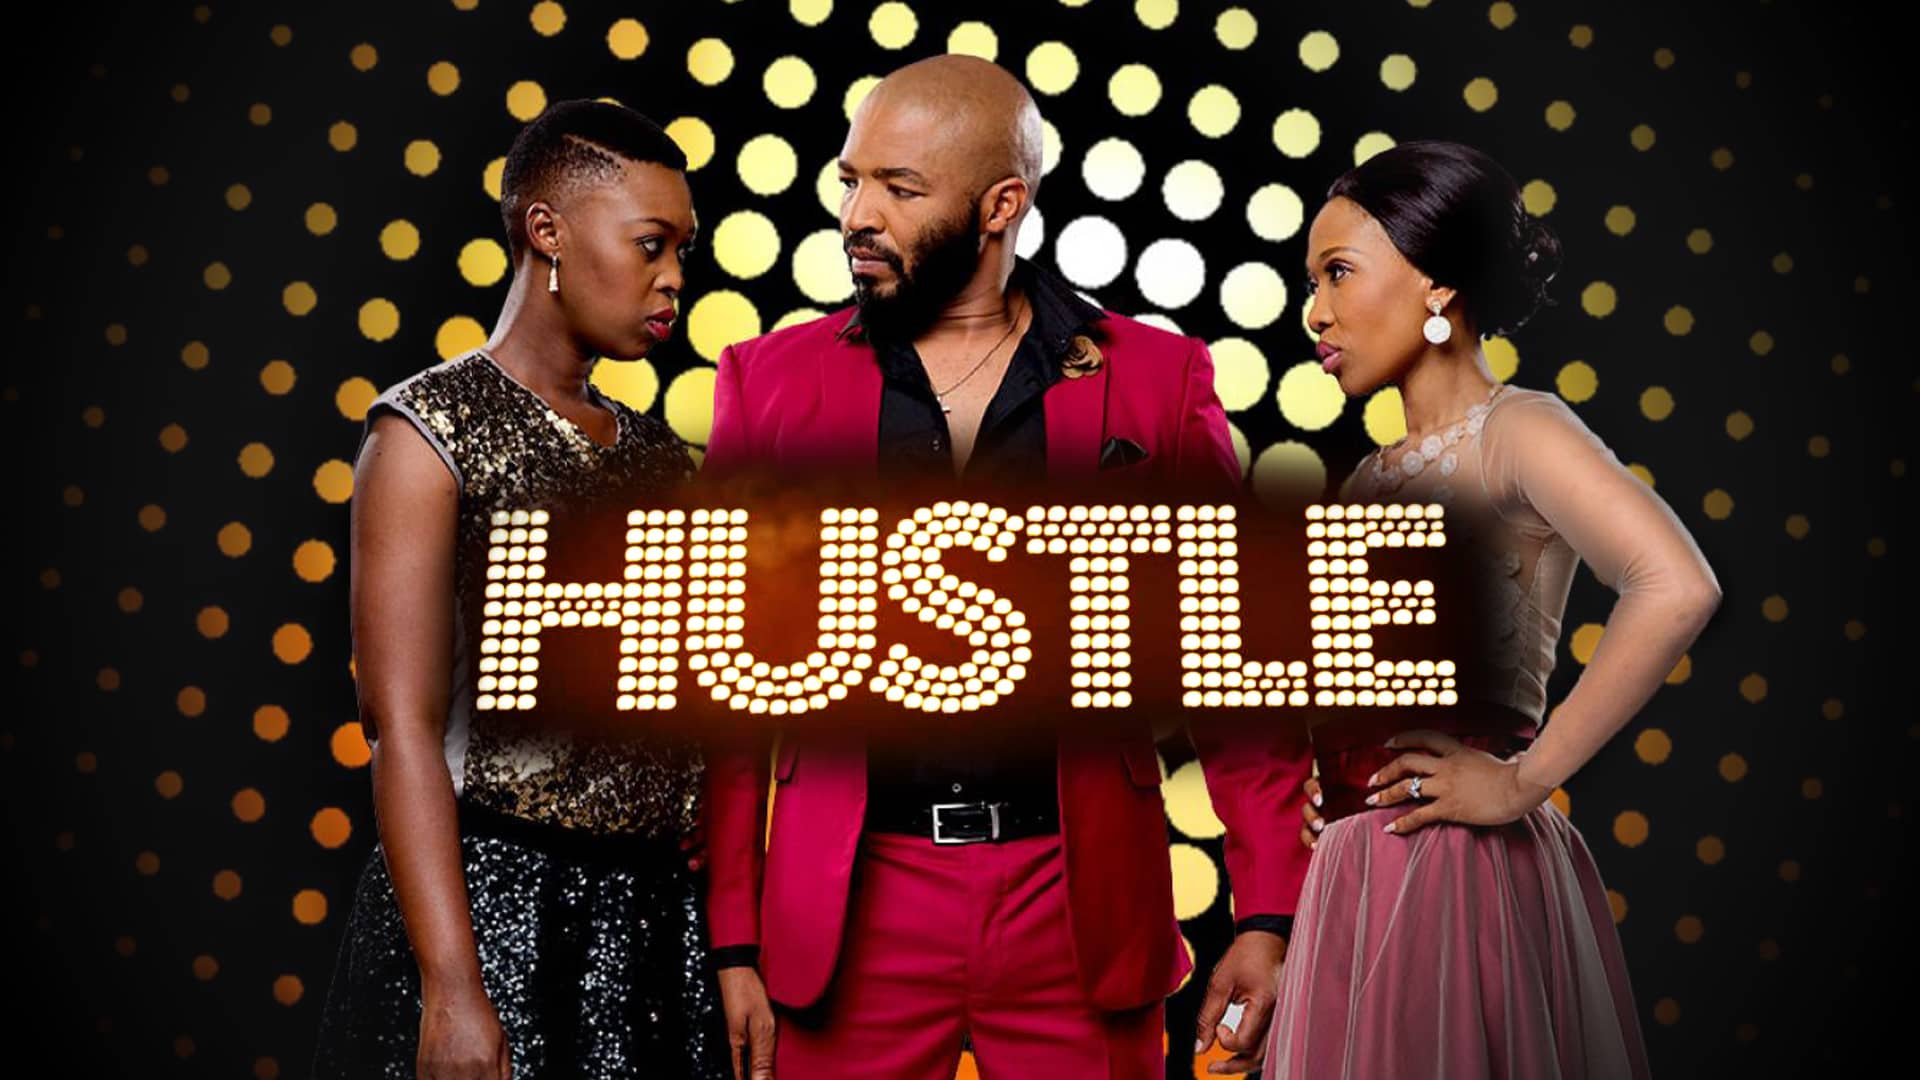 Hustle Poster 1920x1080 16x9